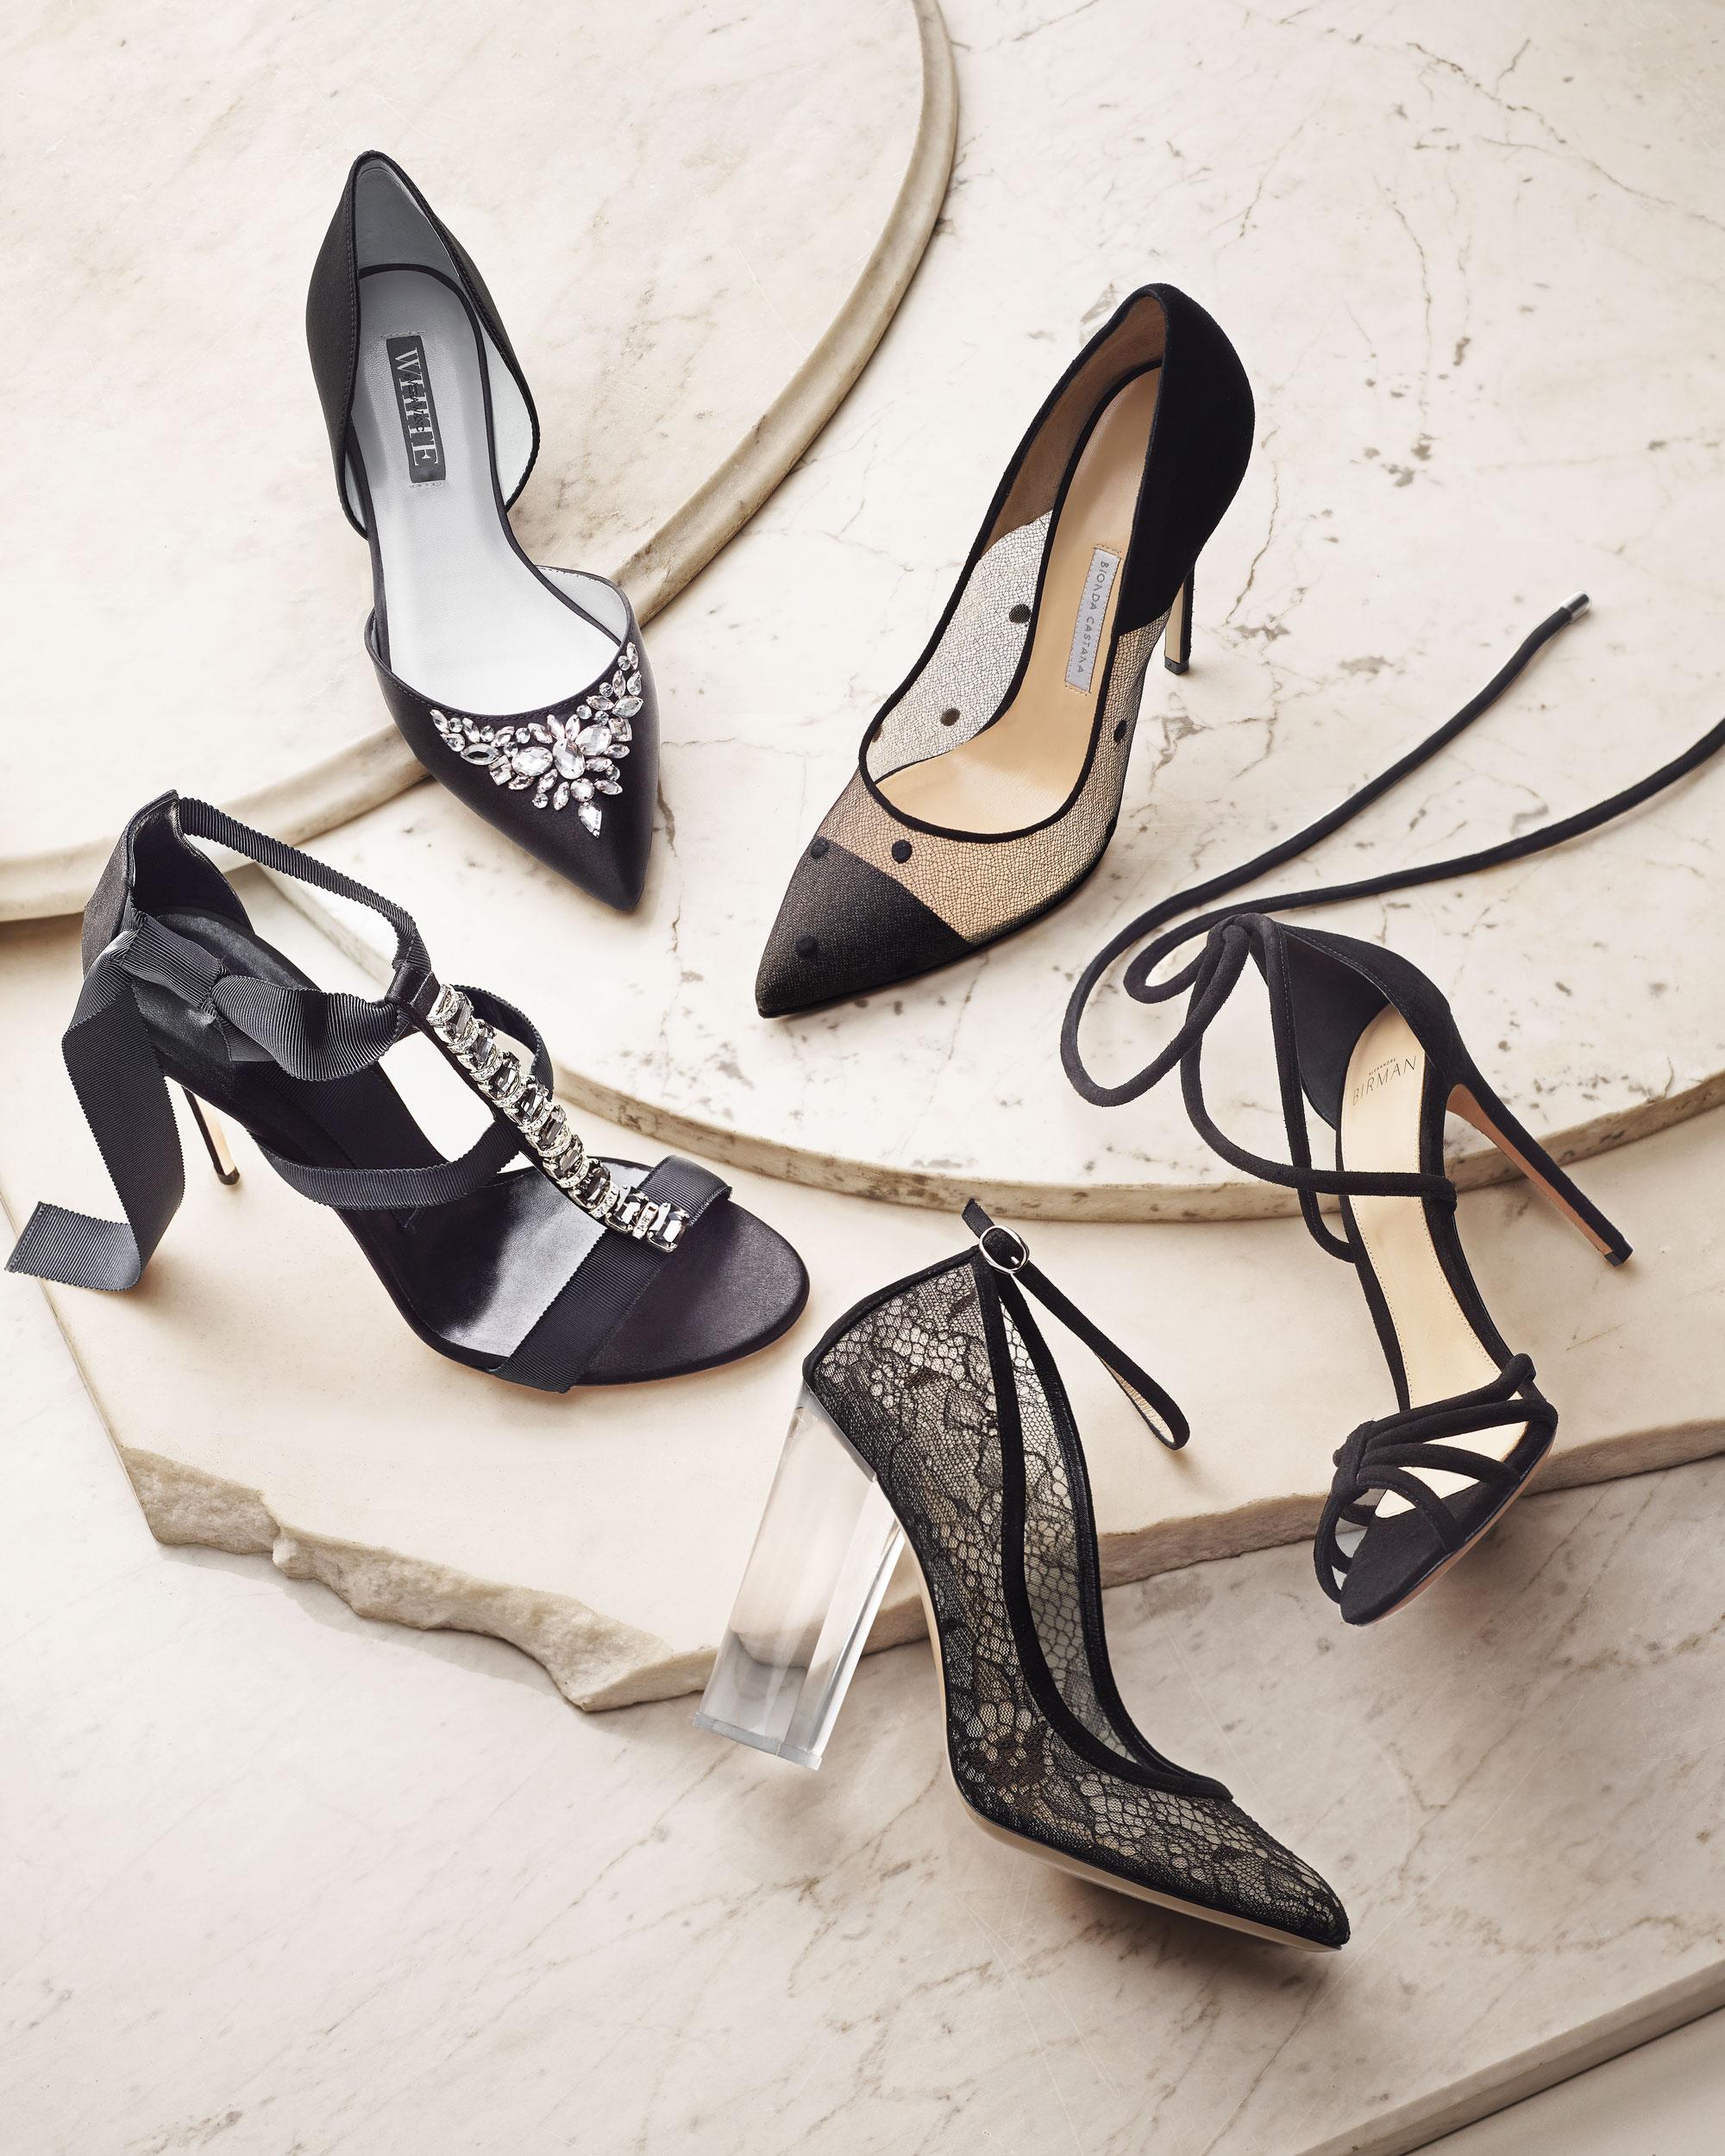 style-black-pumps-d112694.jpg